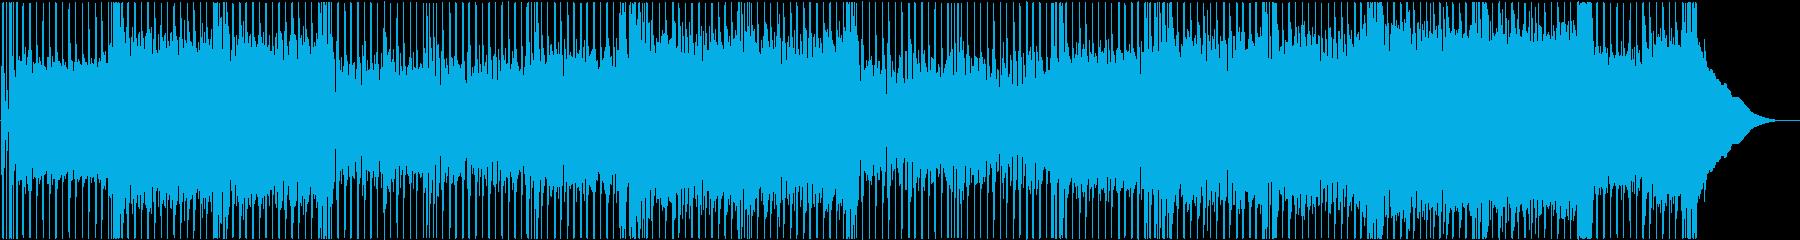 Heat Upの再生済みの波形